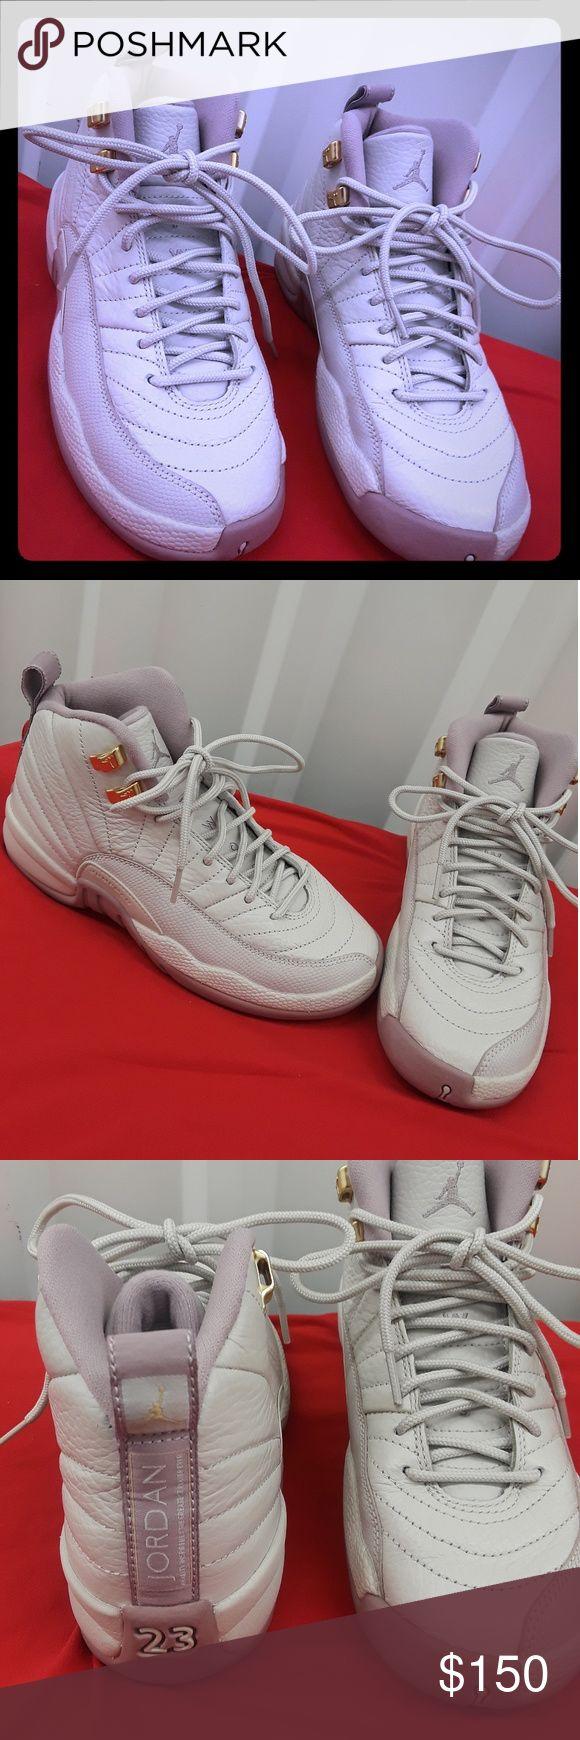 4Y retro Jordan's 4Y retro Jordan's lavender/gryish white Jordan Shoes Sneakers